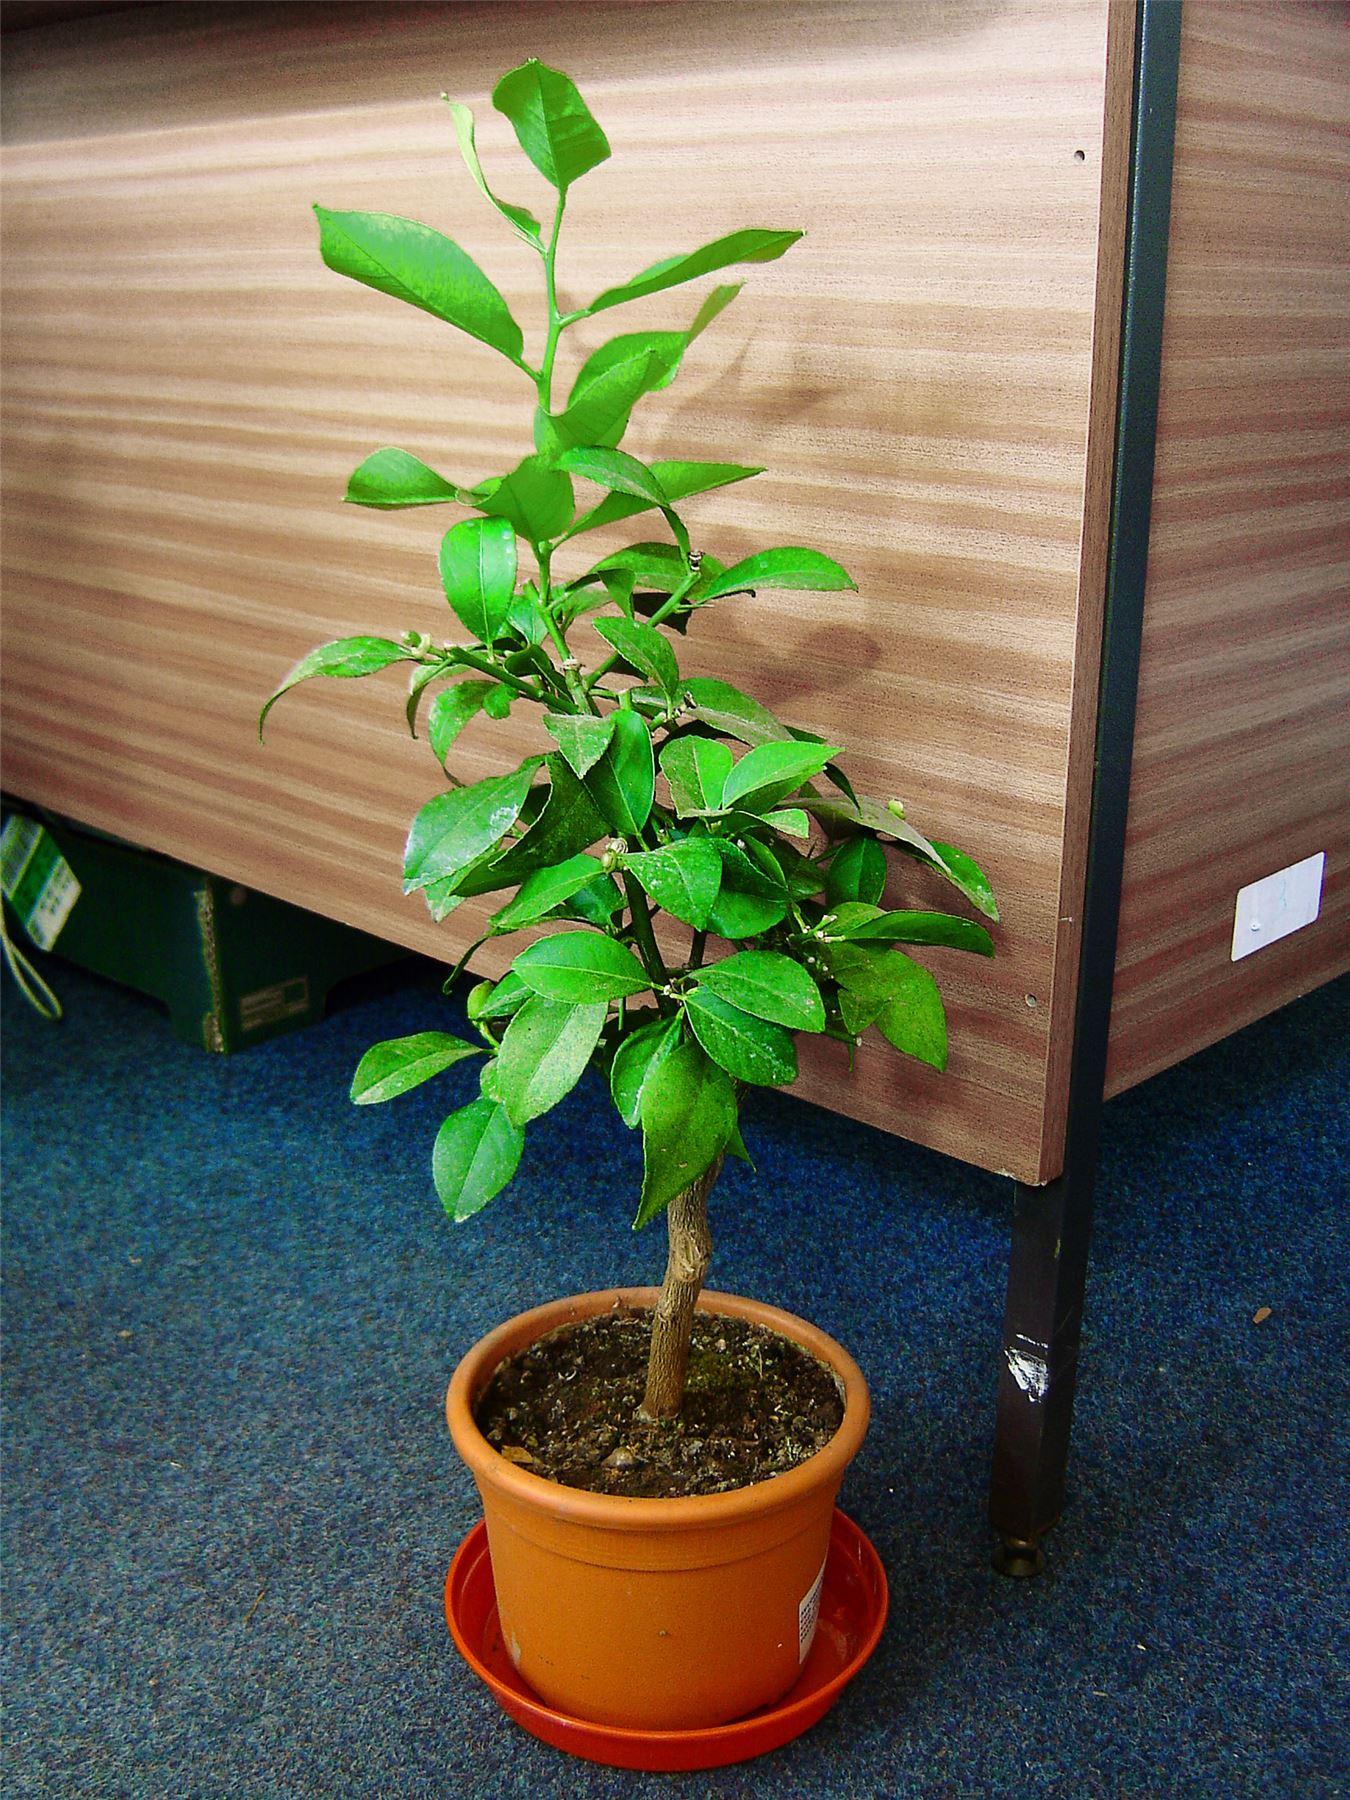 1 lemon indoor tree pot outdoor garden scent citrus fruit trellis house plant ebay - Best compost for flower pots solutions within reach ...